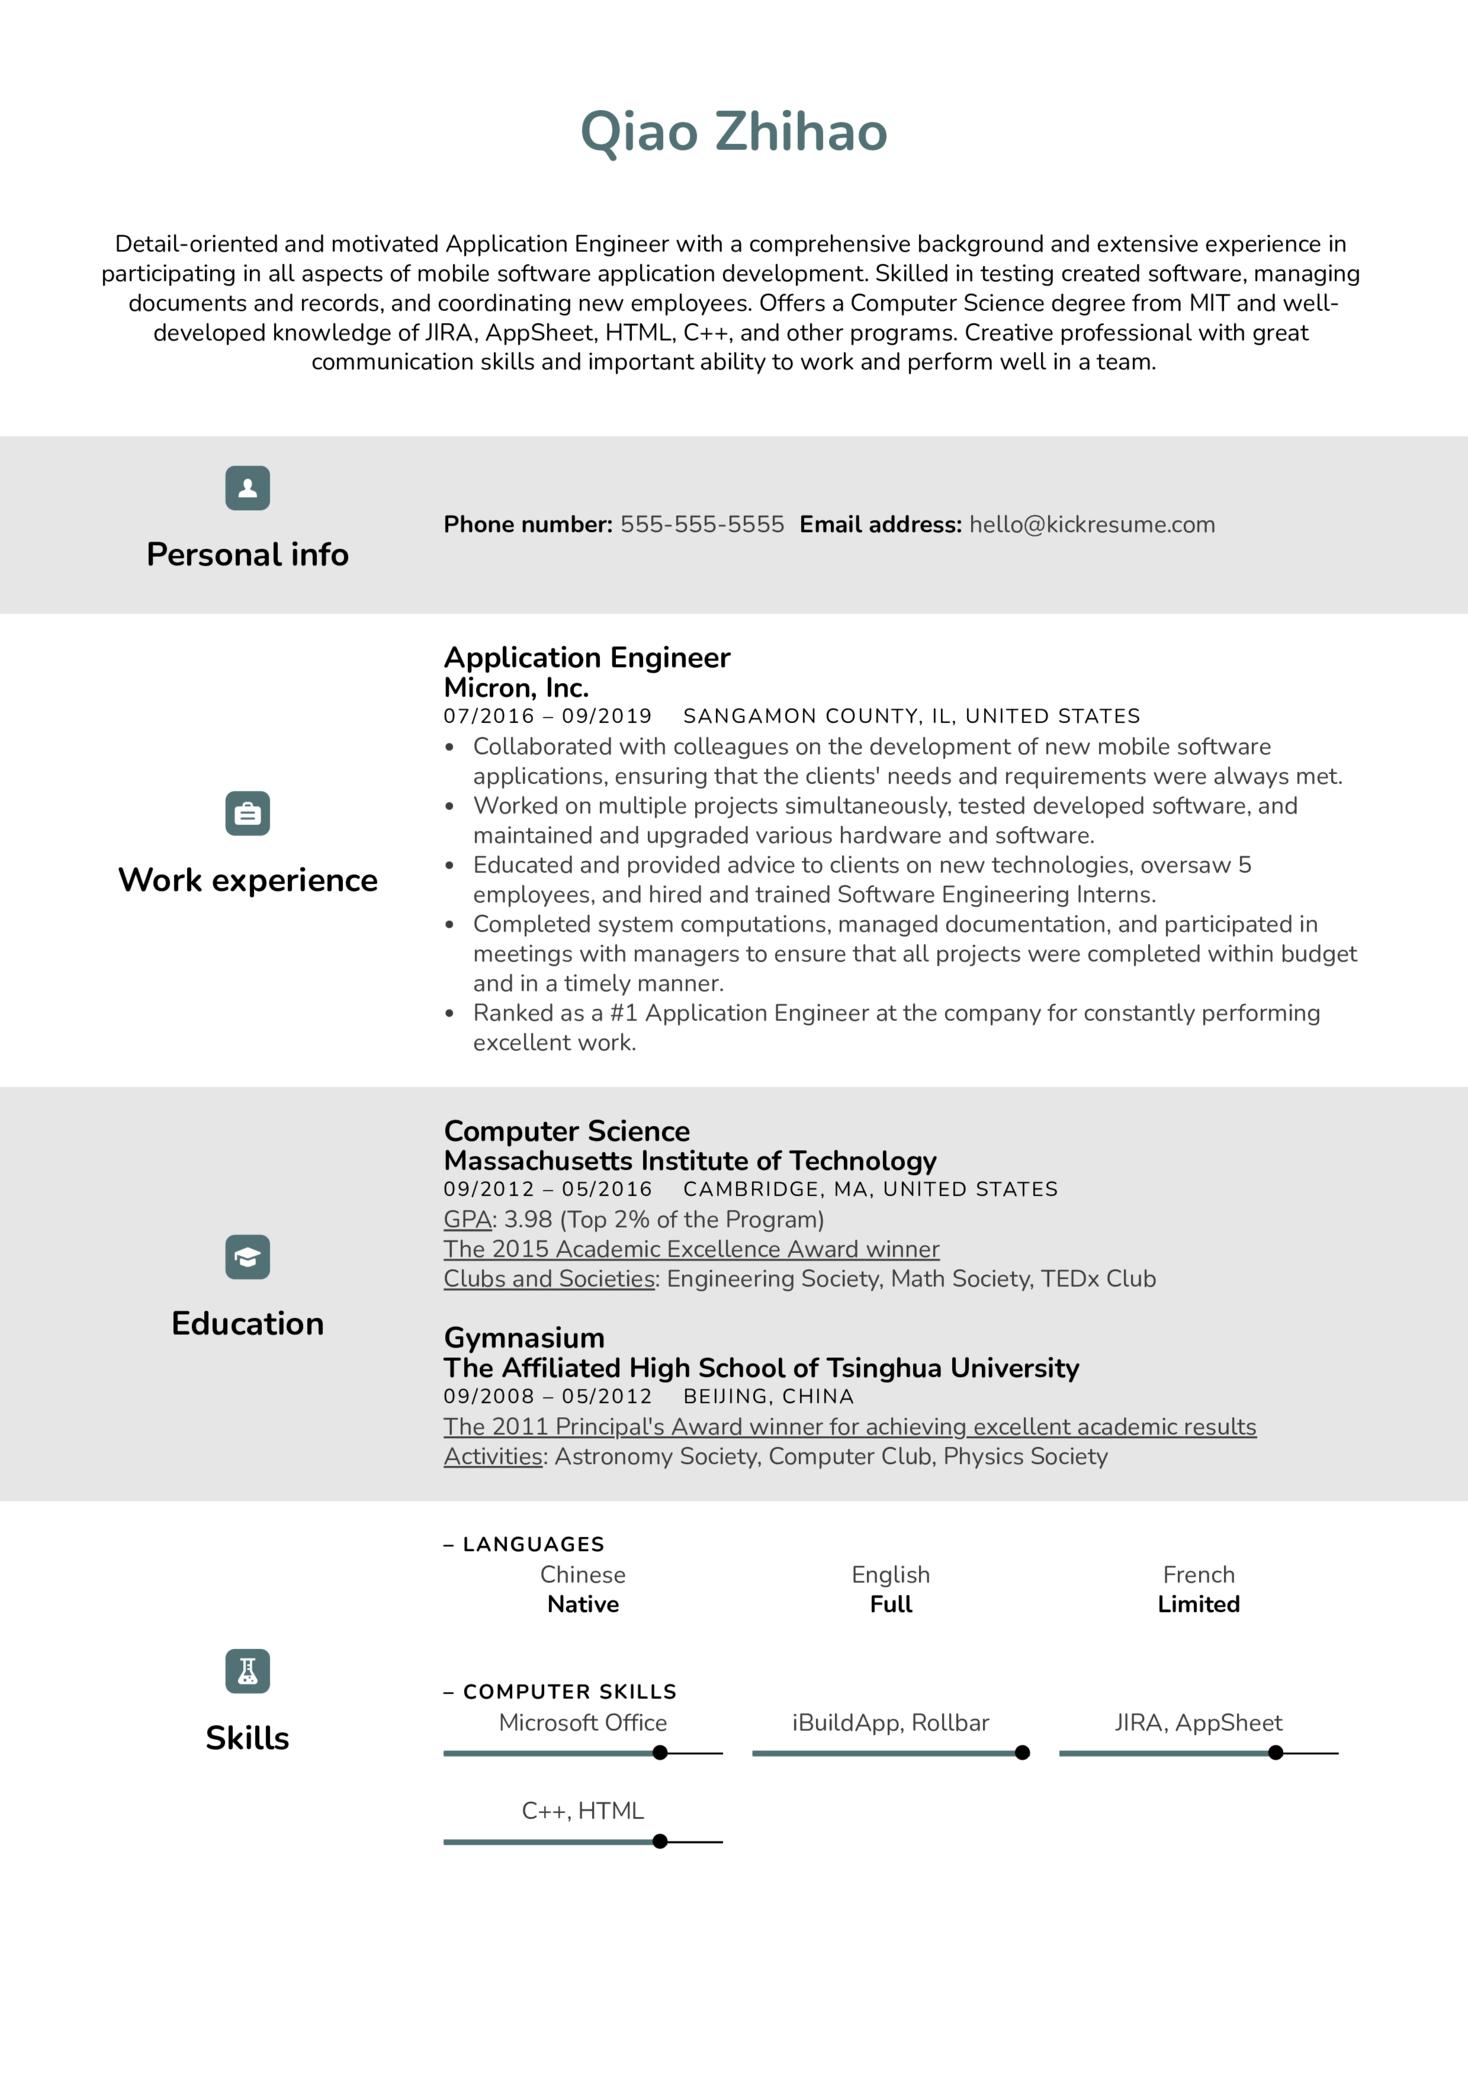 Application Engineer Resume Sample (parte 1)